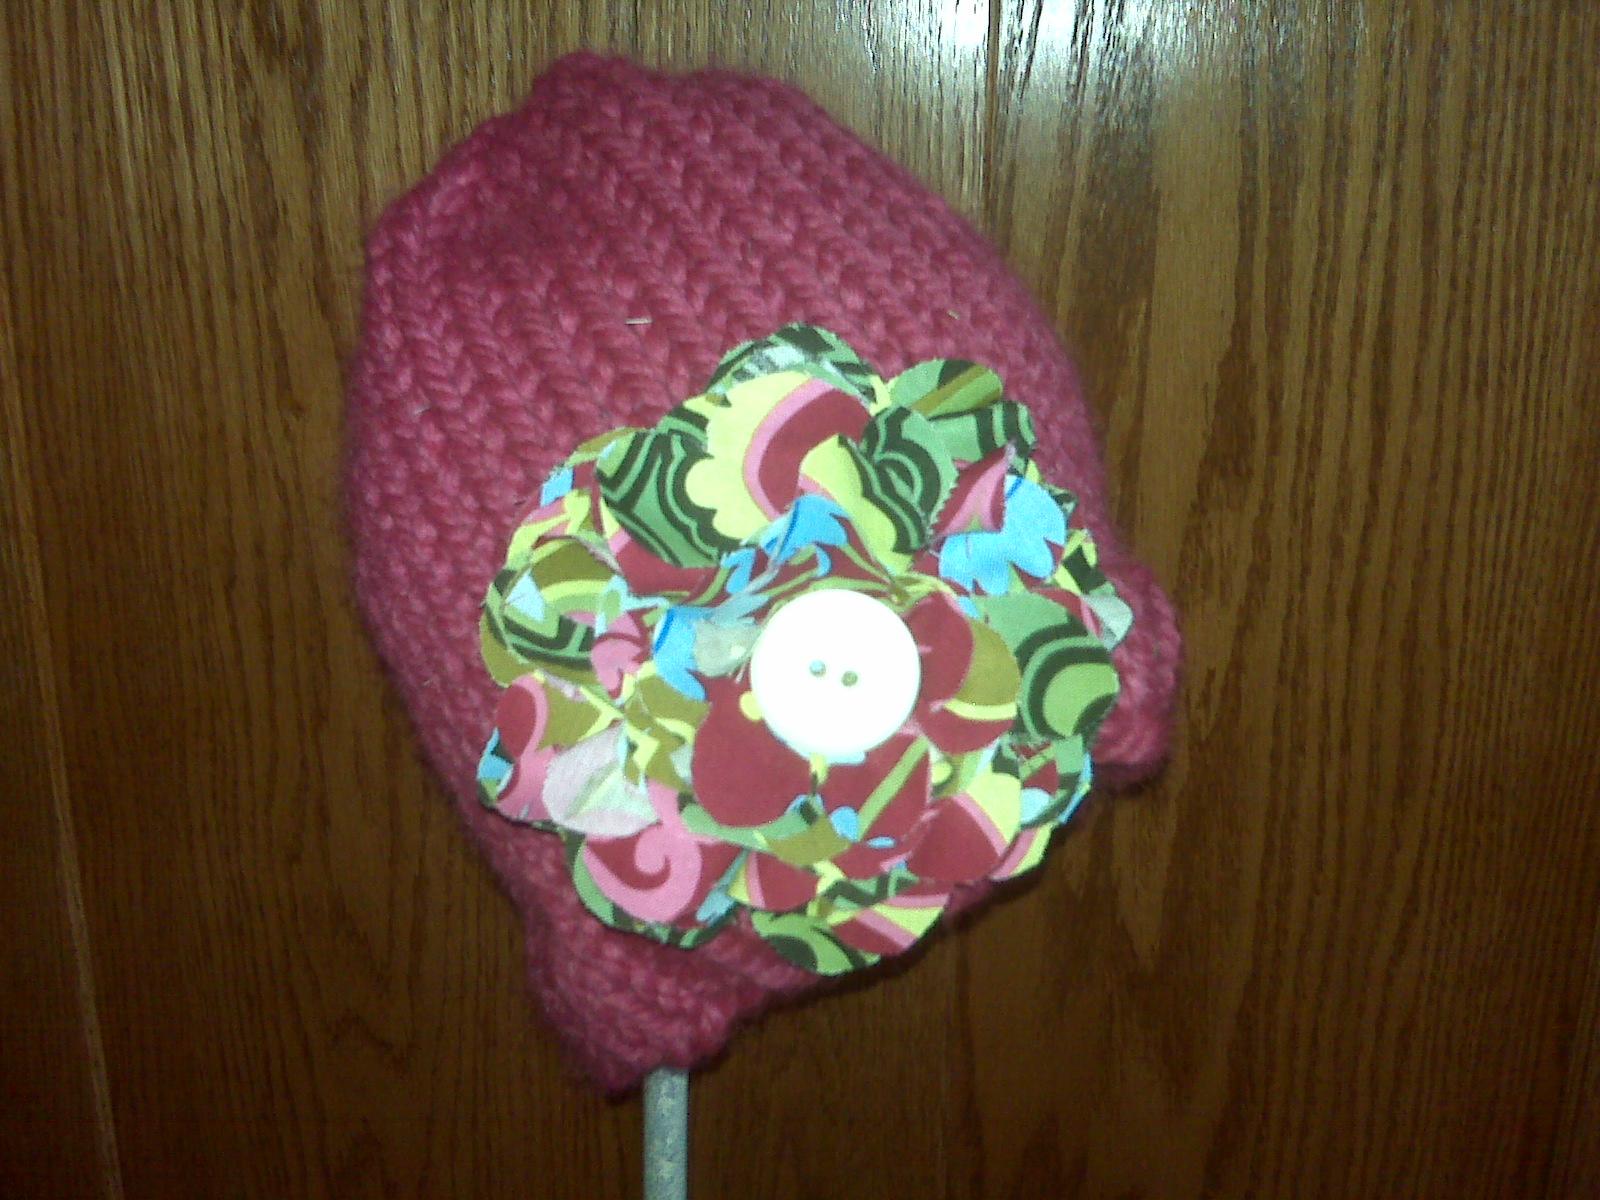 [tiff+fadden+hat.aspx]